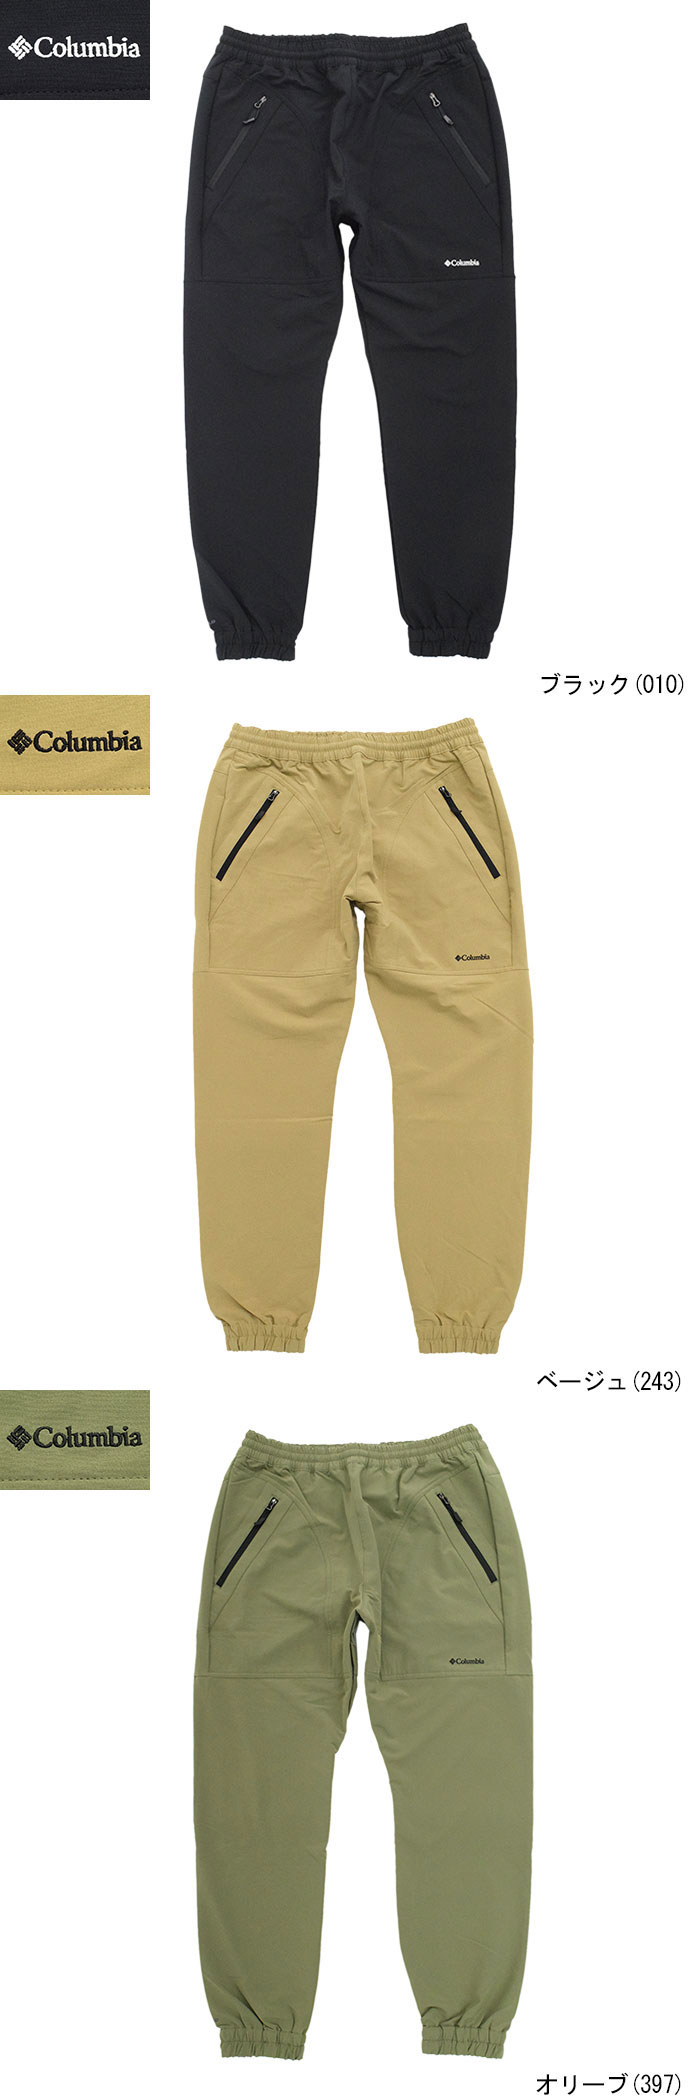 Columbiaコロンビアのパンツ Light Canyon Warm Pant06